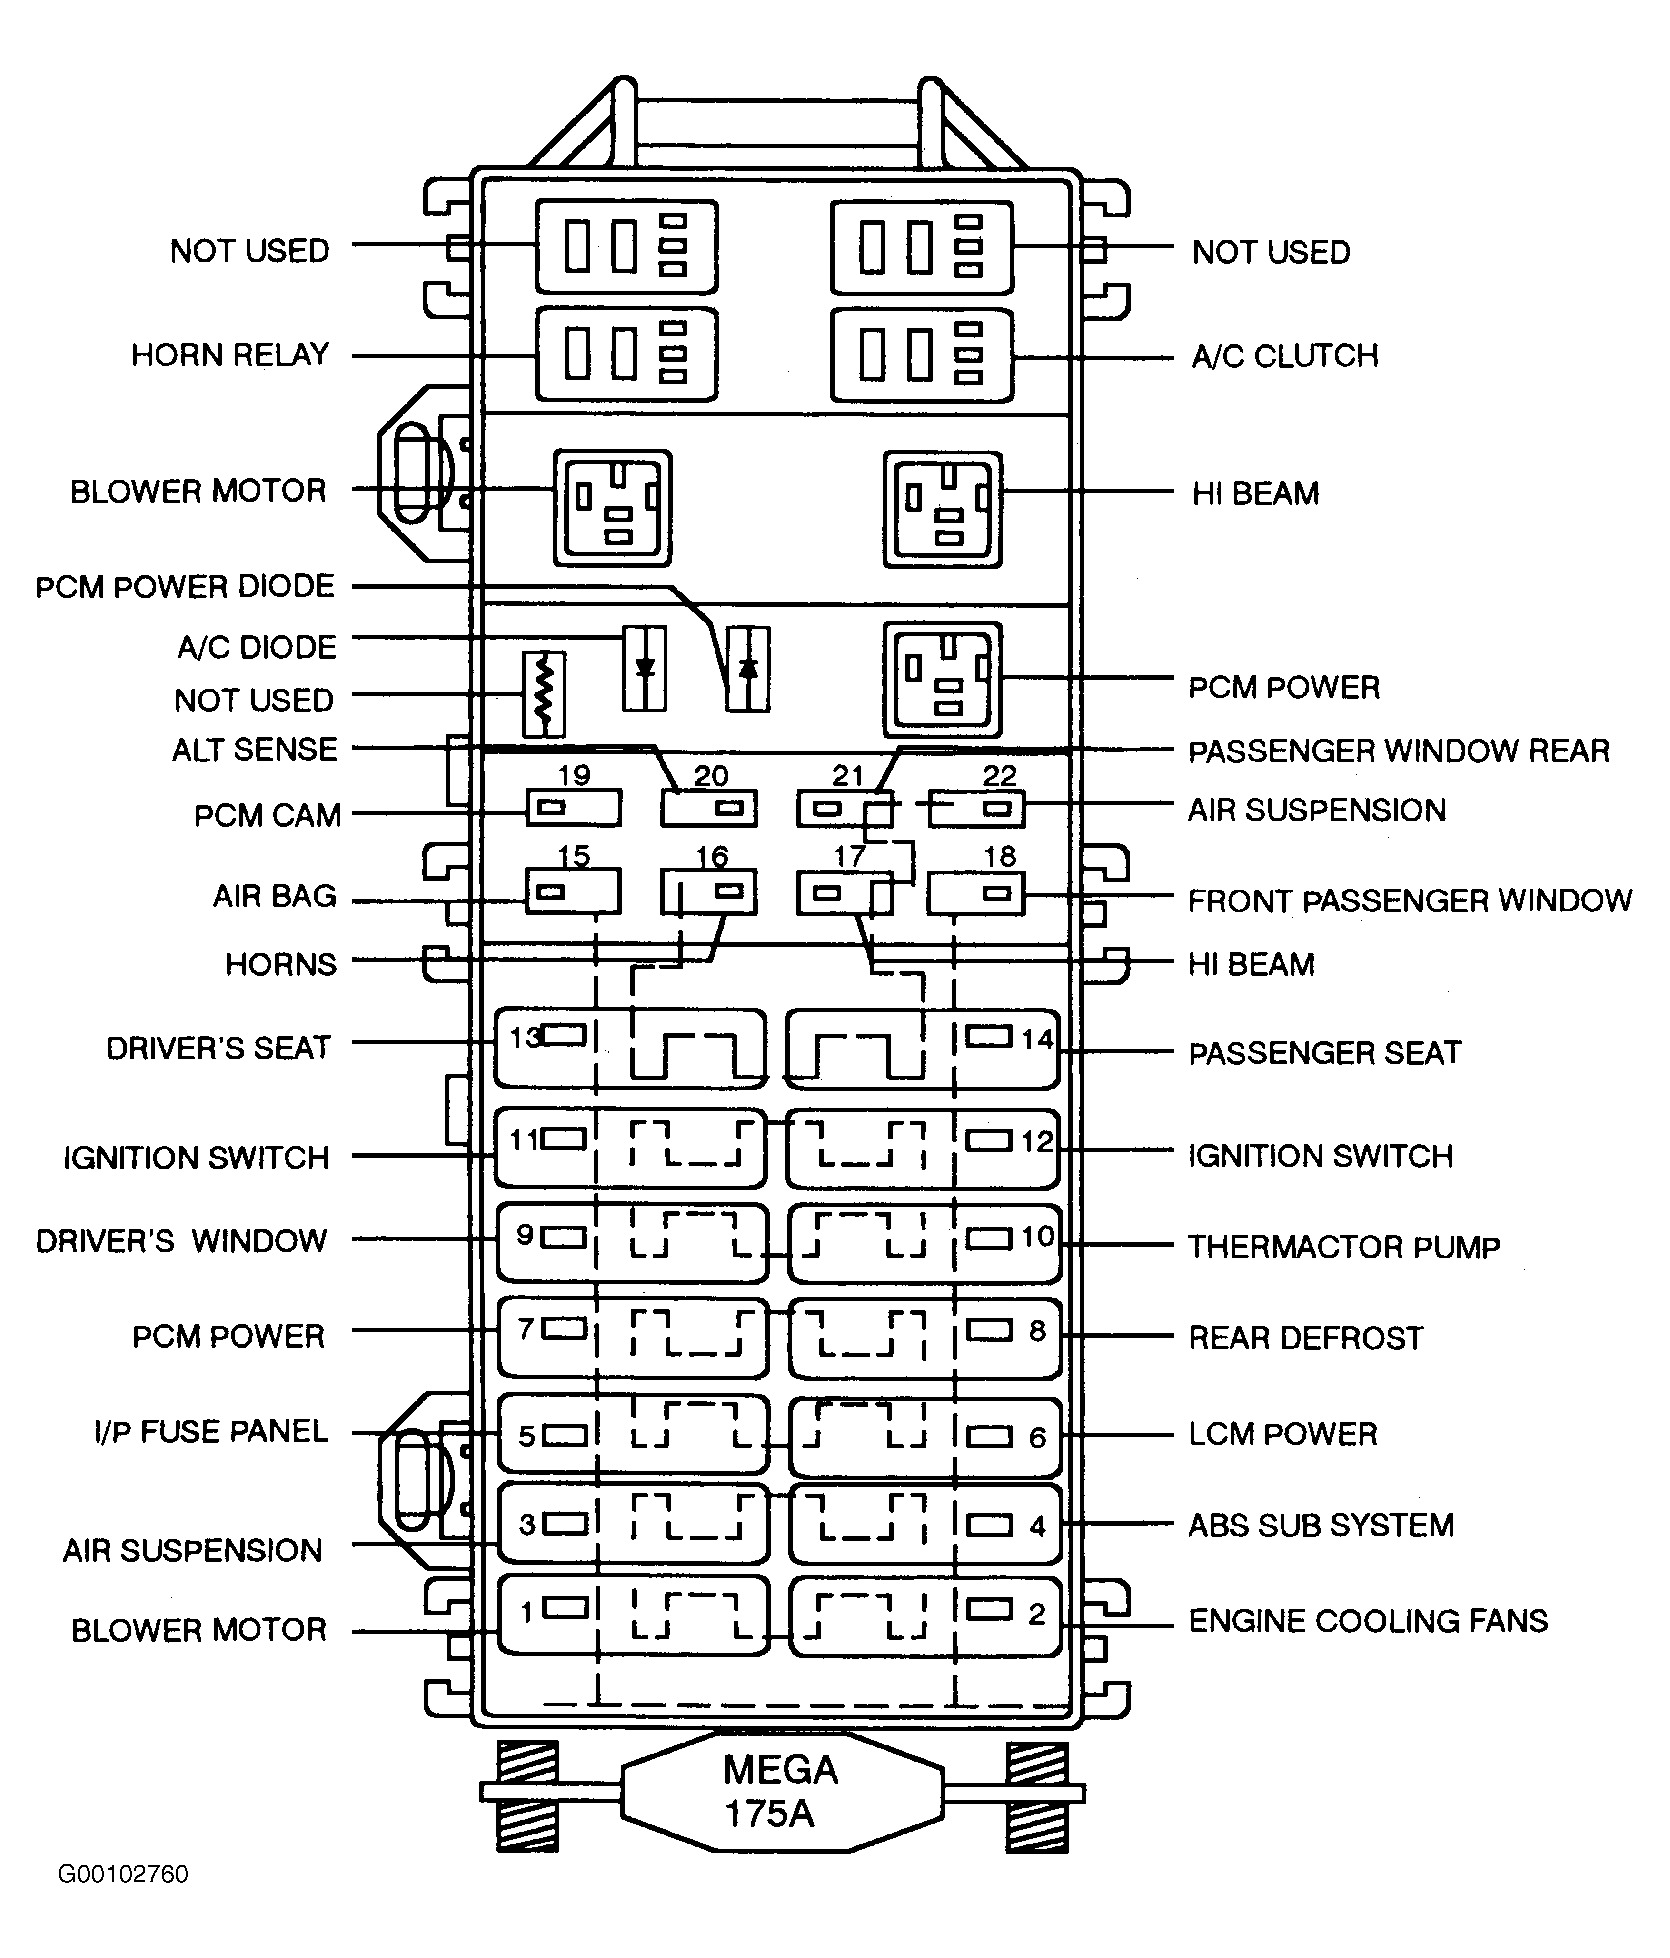 Pleasant Lincoln 98 Mark 8 Fuse Diagram Wiring Diagram Wiring Cloud Hemtshollocom